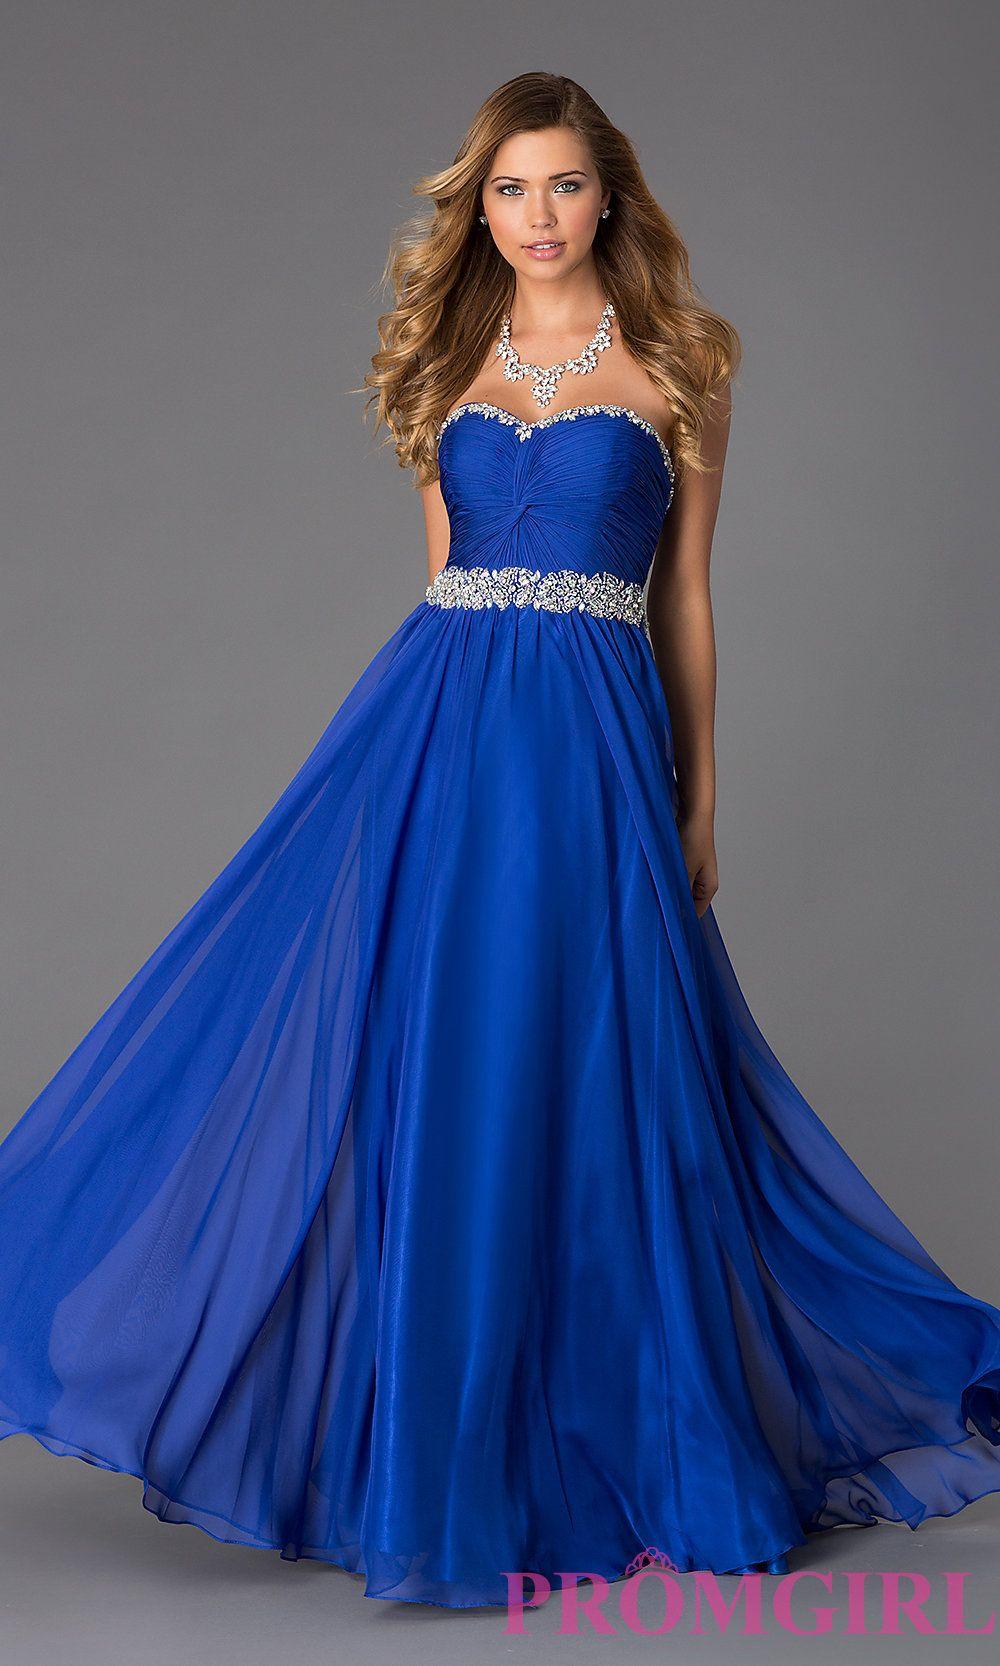 Style al front image prom pinterest dresses